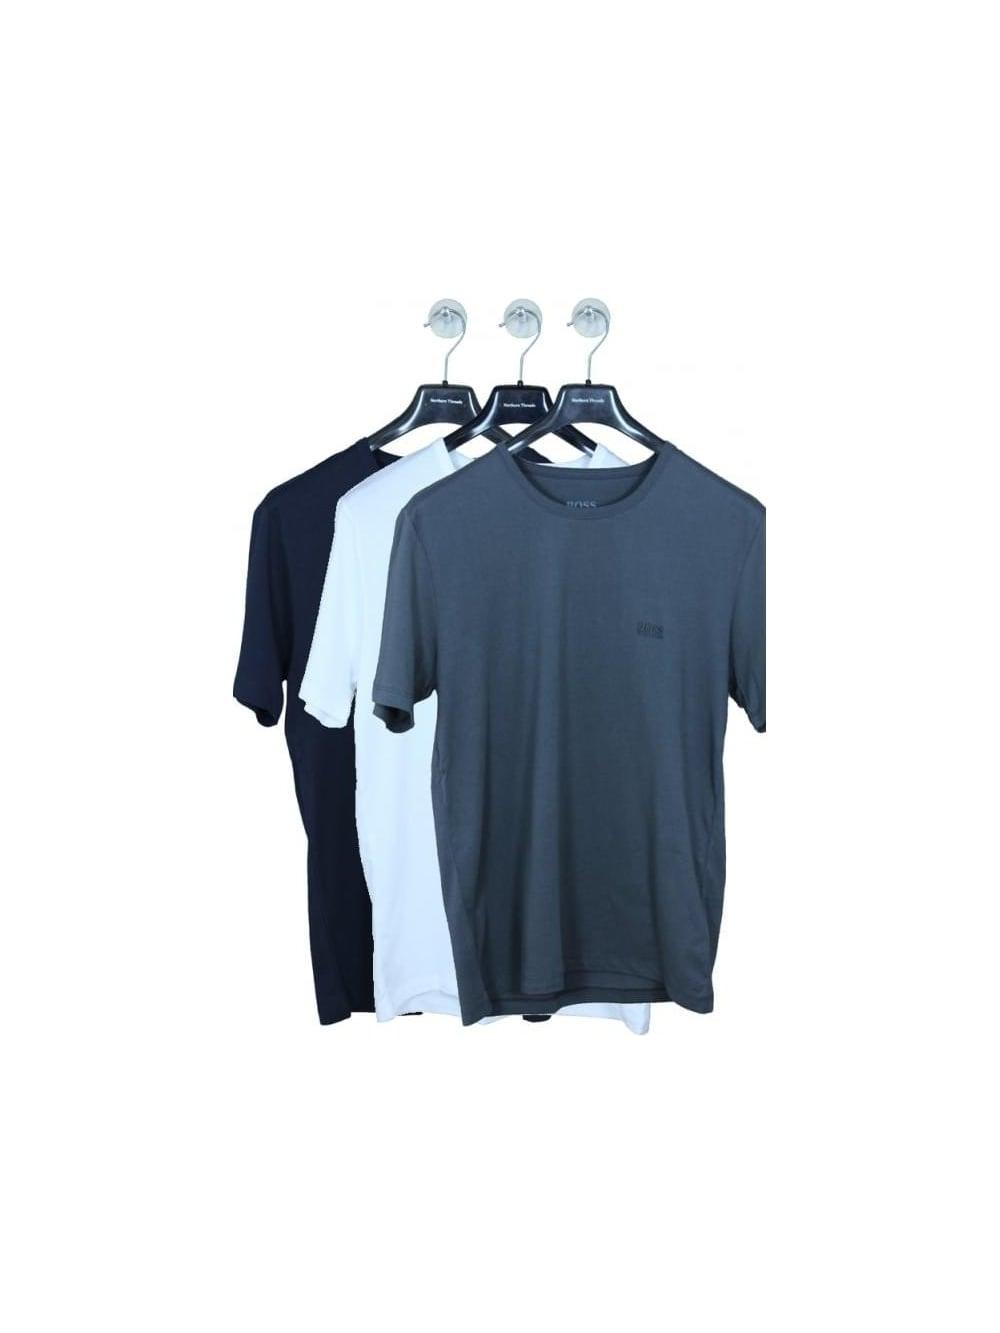 HUGO BOSS BOSS Hugo Boss 3 Pack T Shirt Box Set in Multi - Northern ... e4522cab7adf